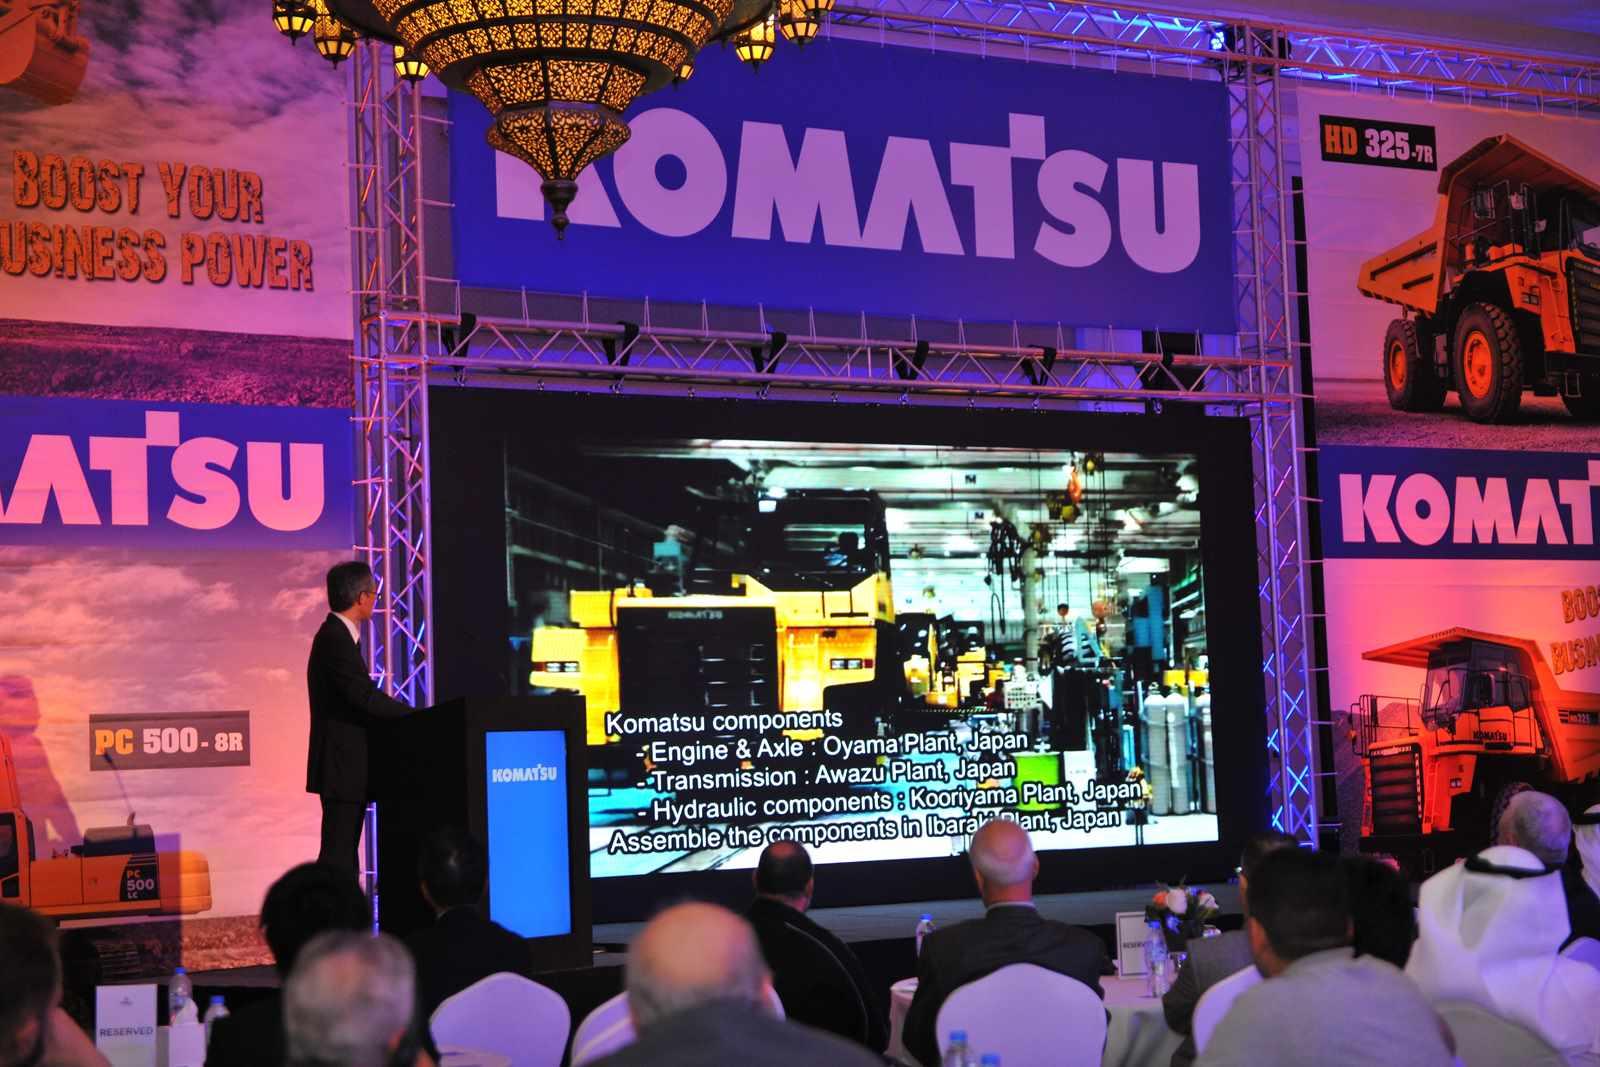 Komatsu Quarry Seminar 2018